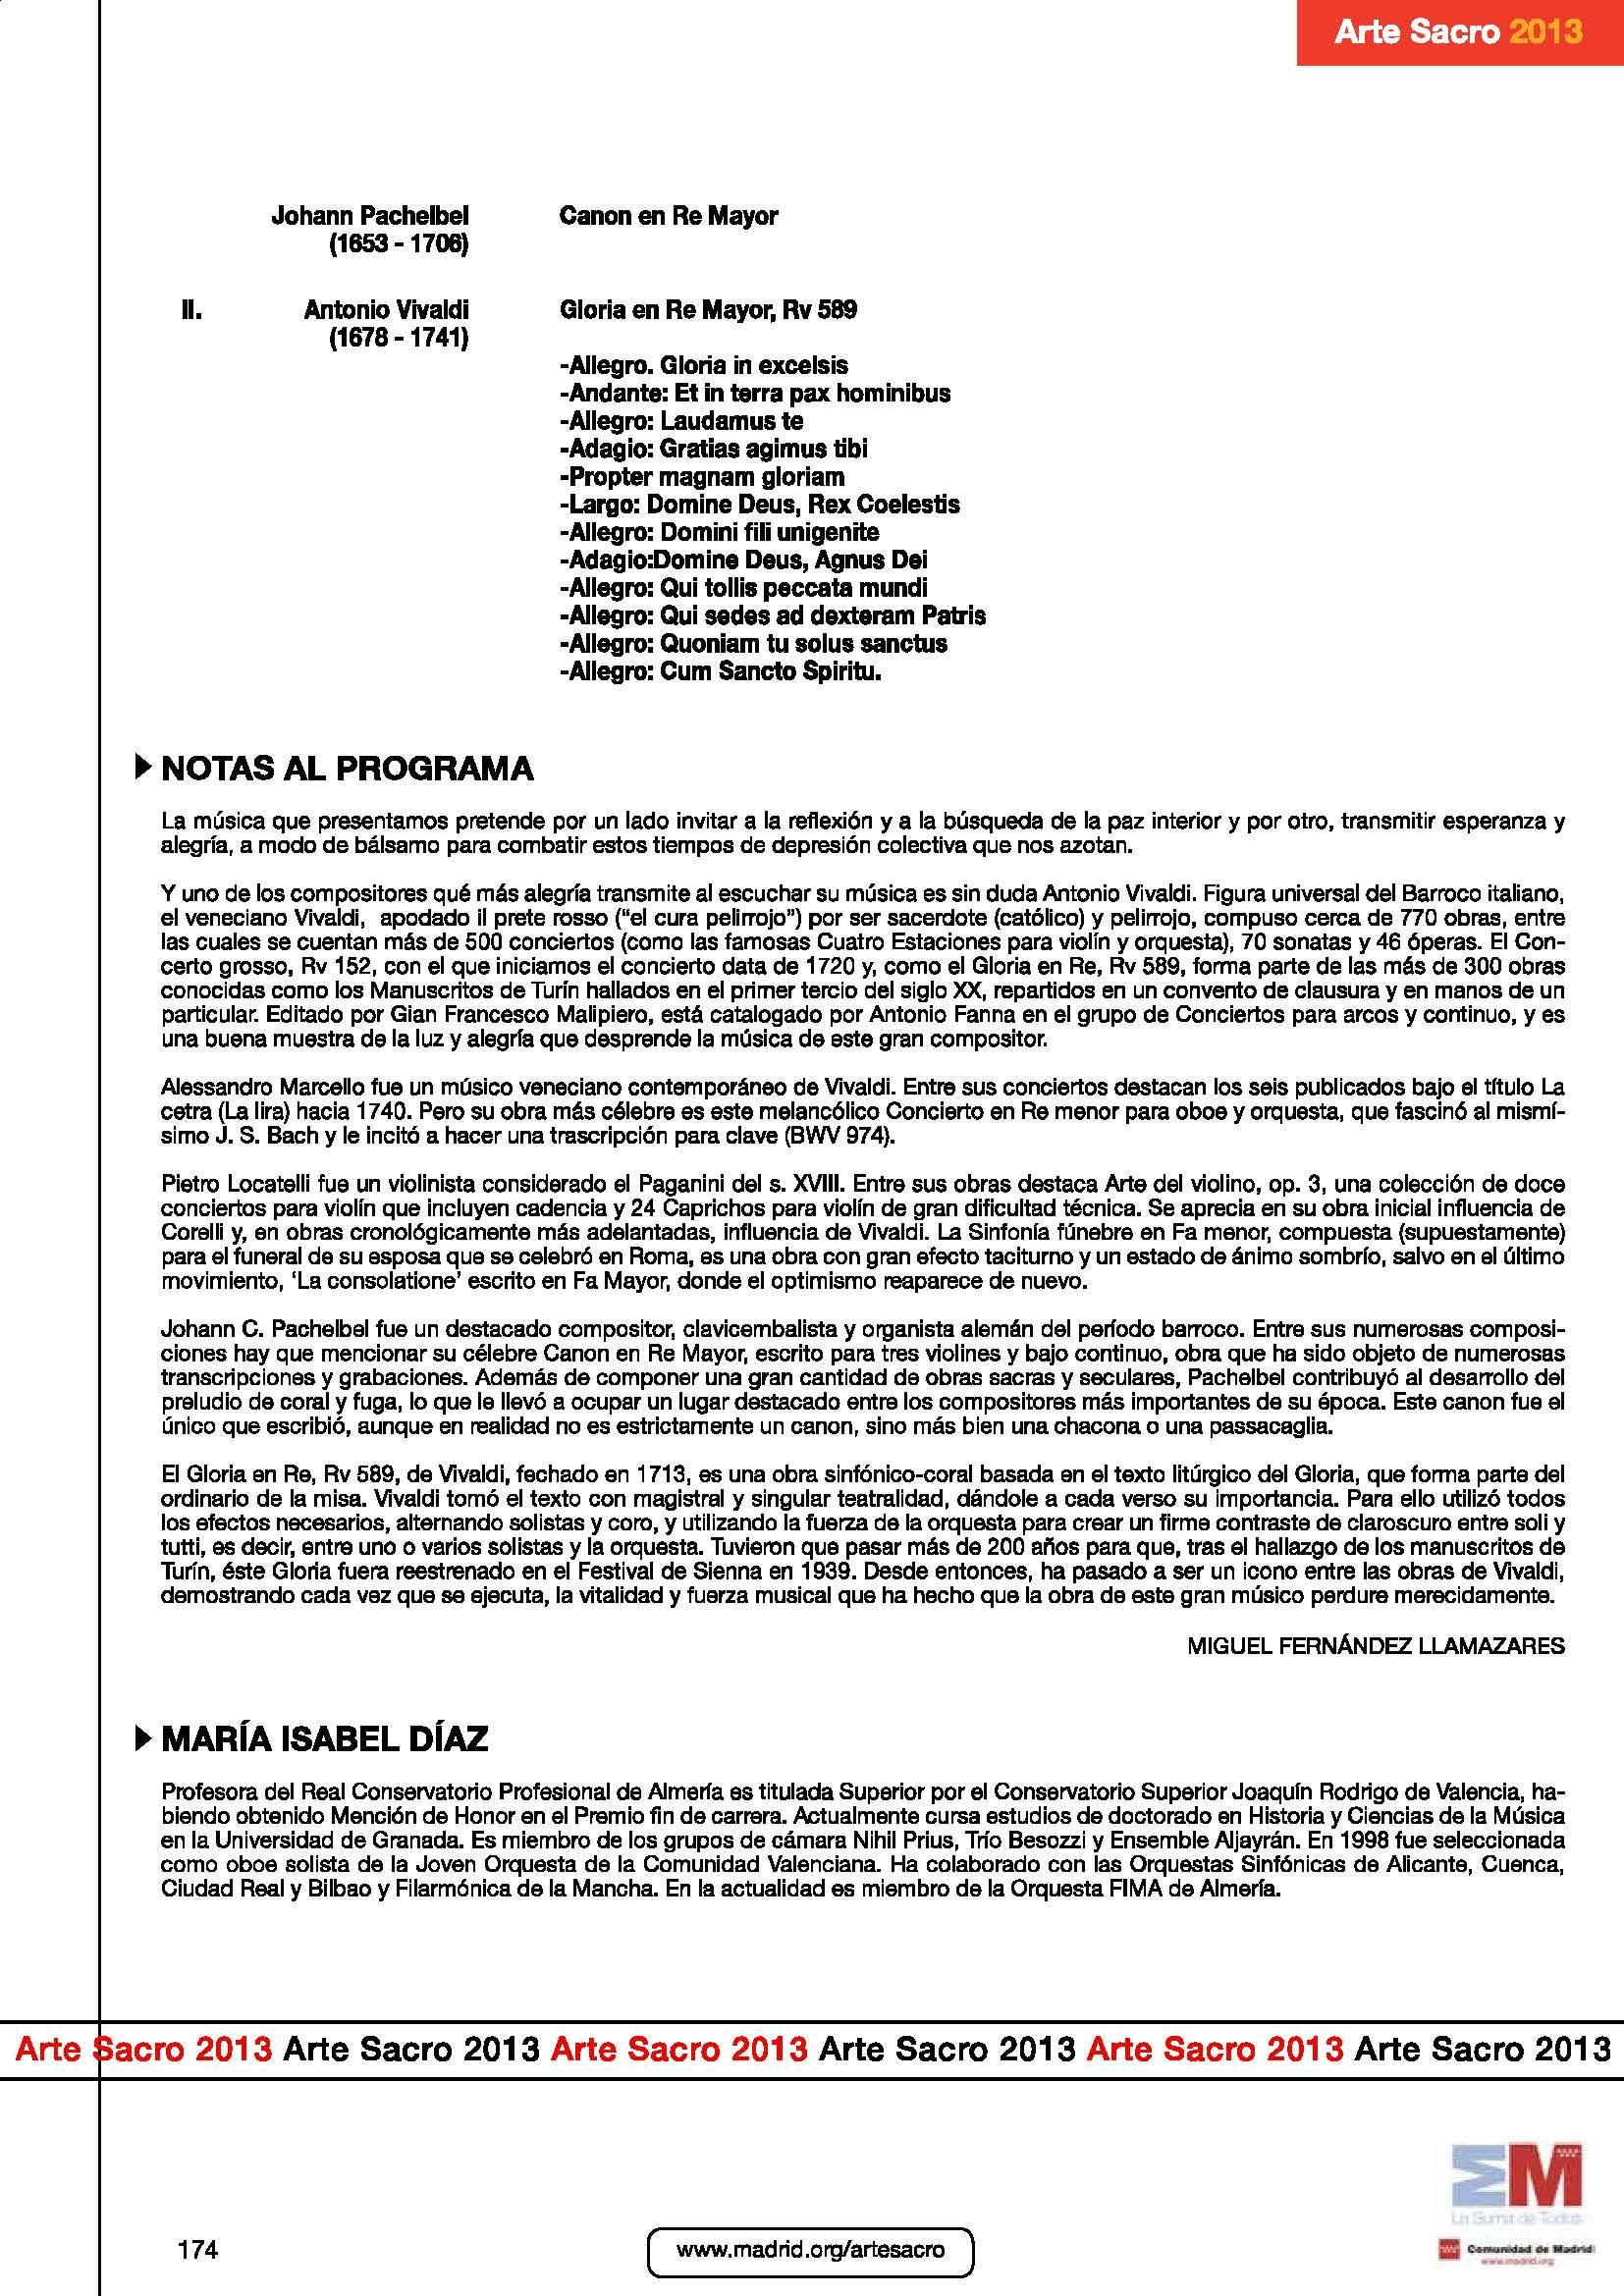 dossier_completo_Página_174